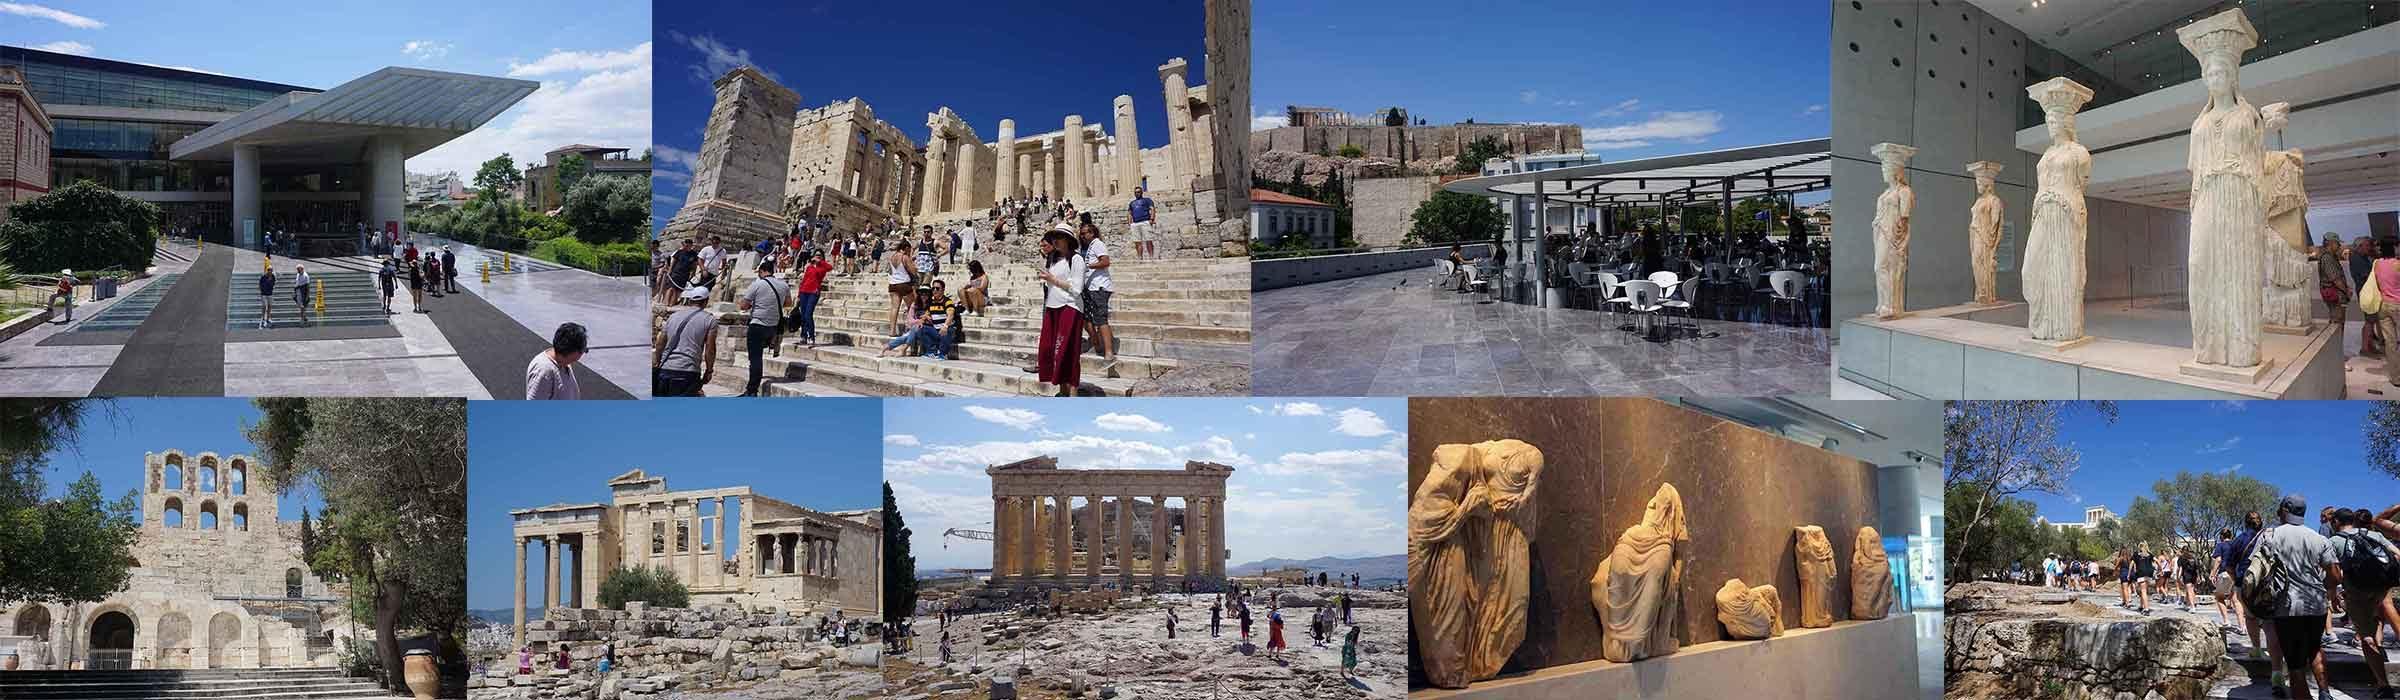 AcropolisPostBannerWEB-2400x700